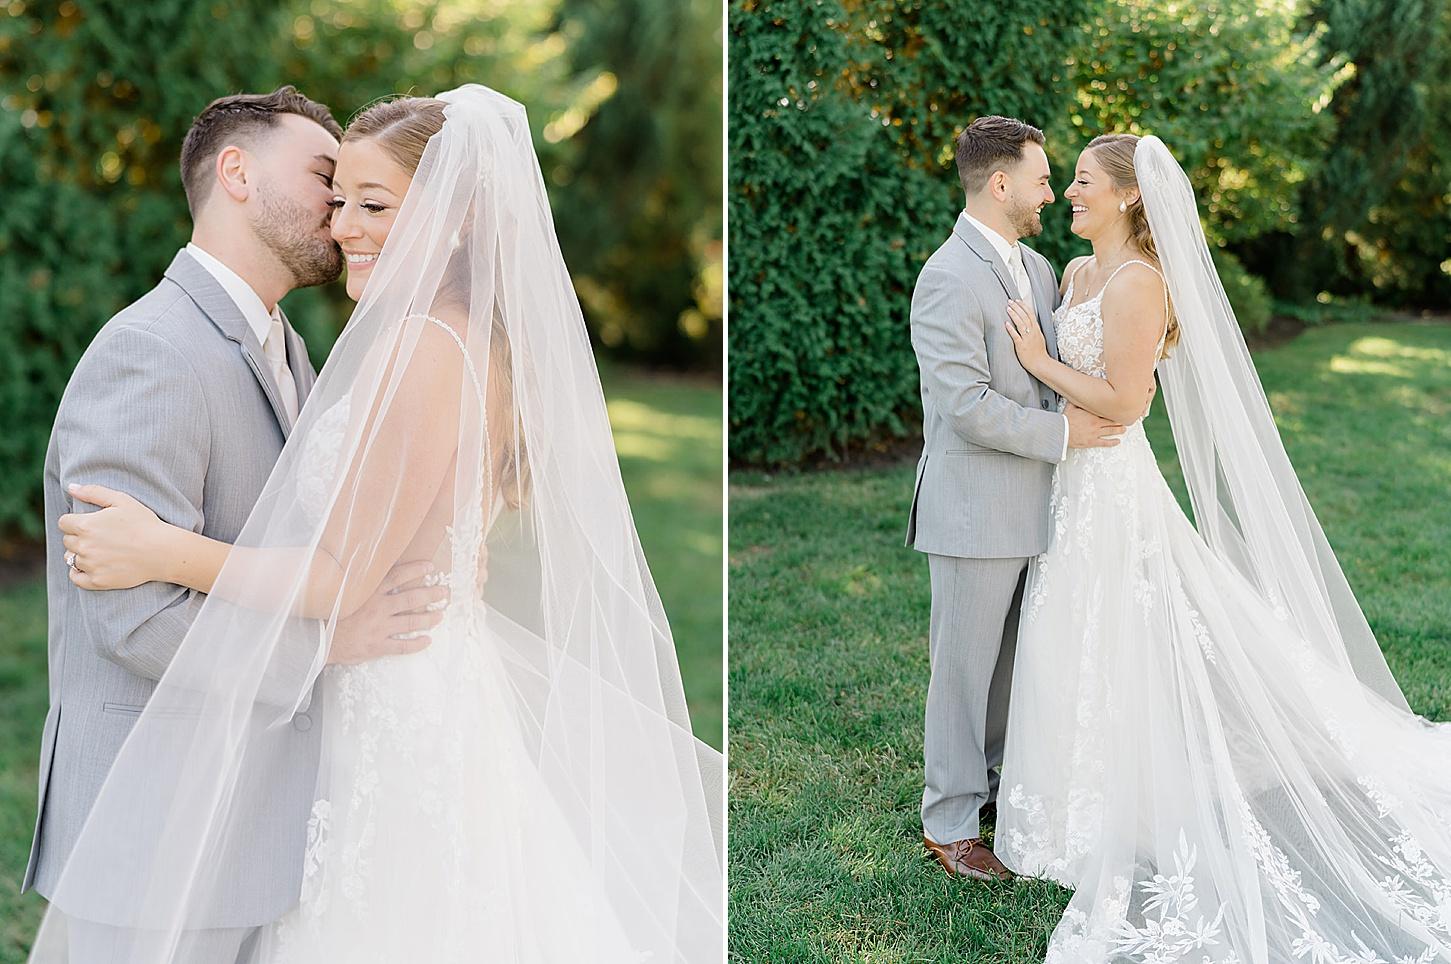 Valenzano Winery Vitners Pavillion Wedding Photography by Magdalena Studios 0010